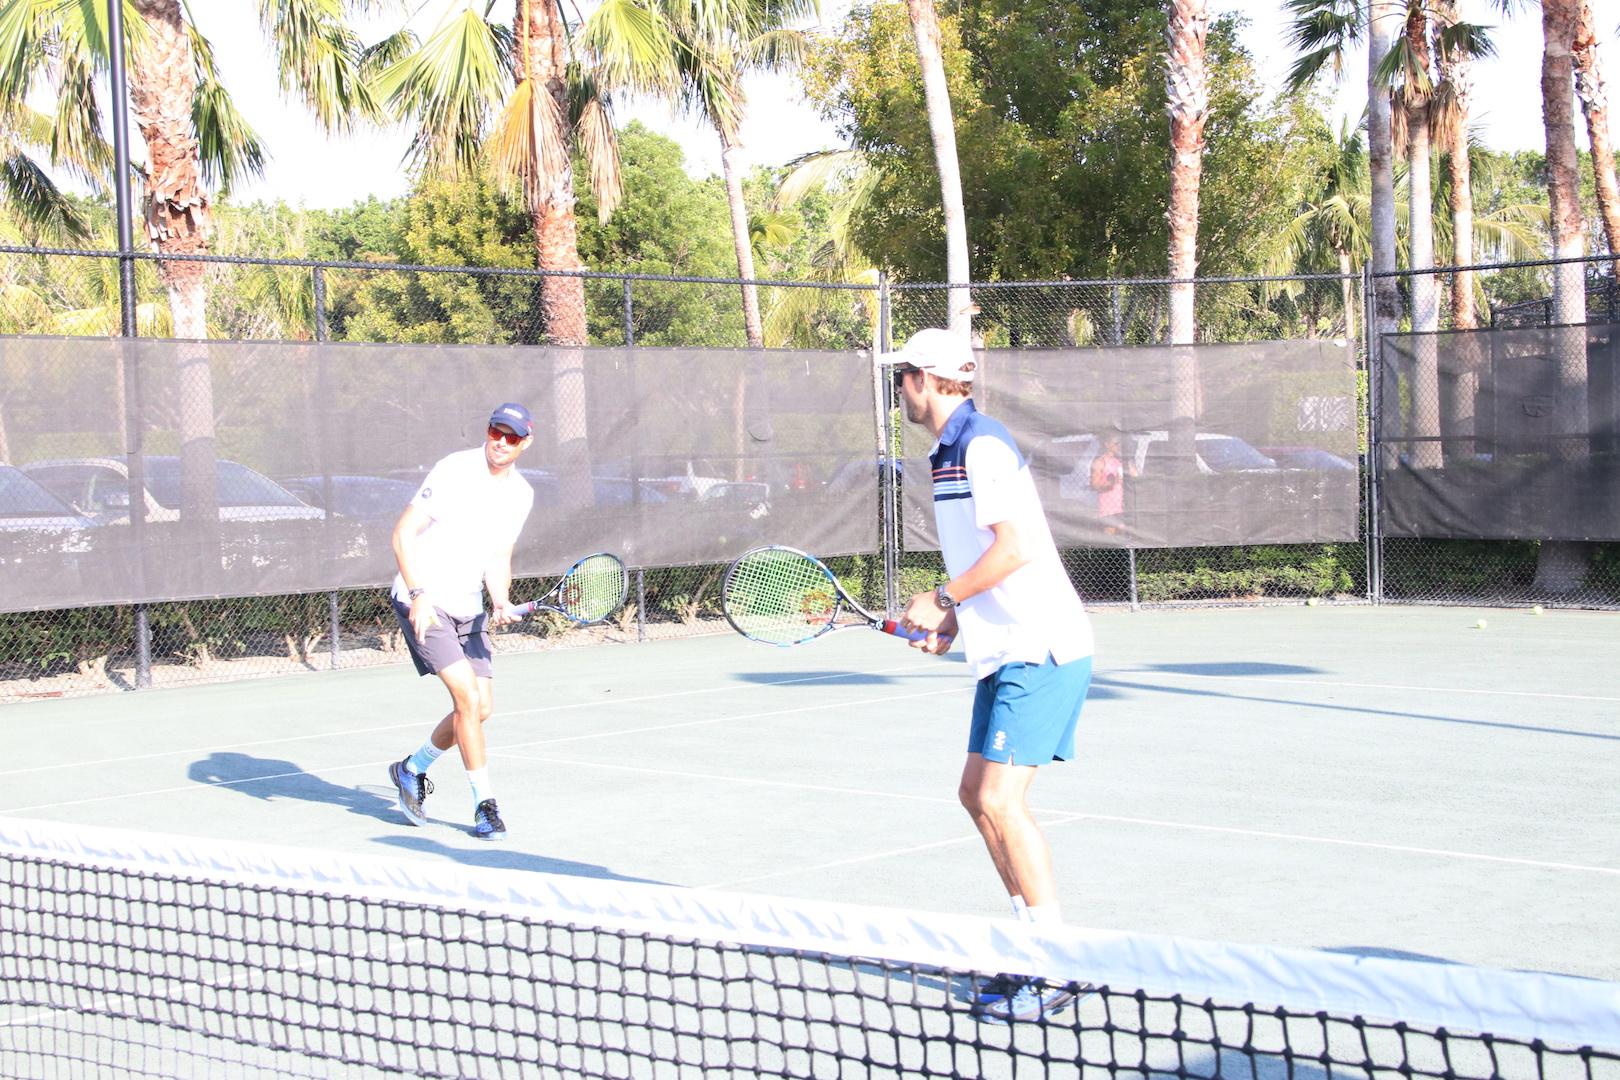 tennis-Bryans2.JPG